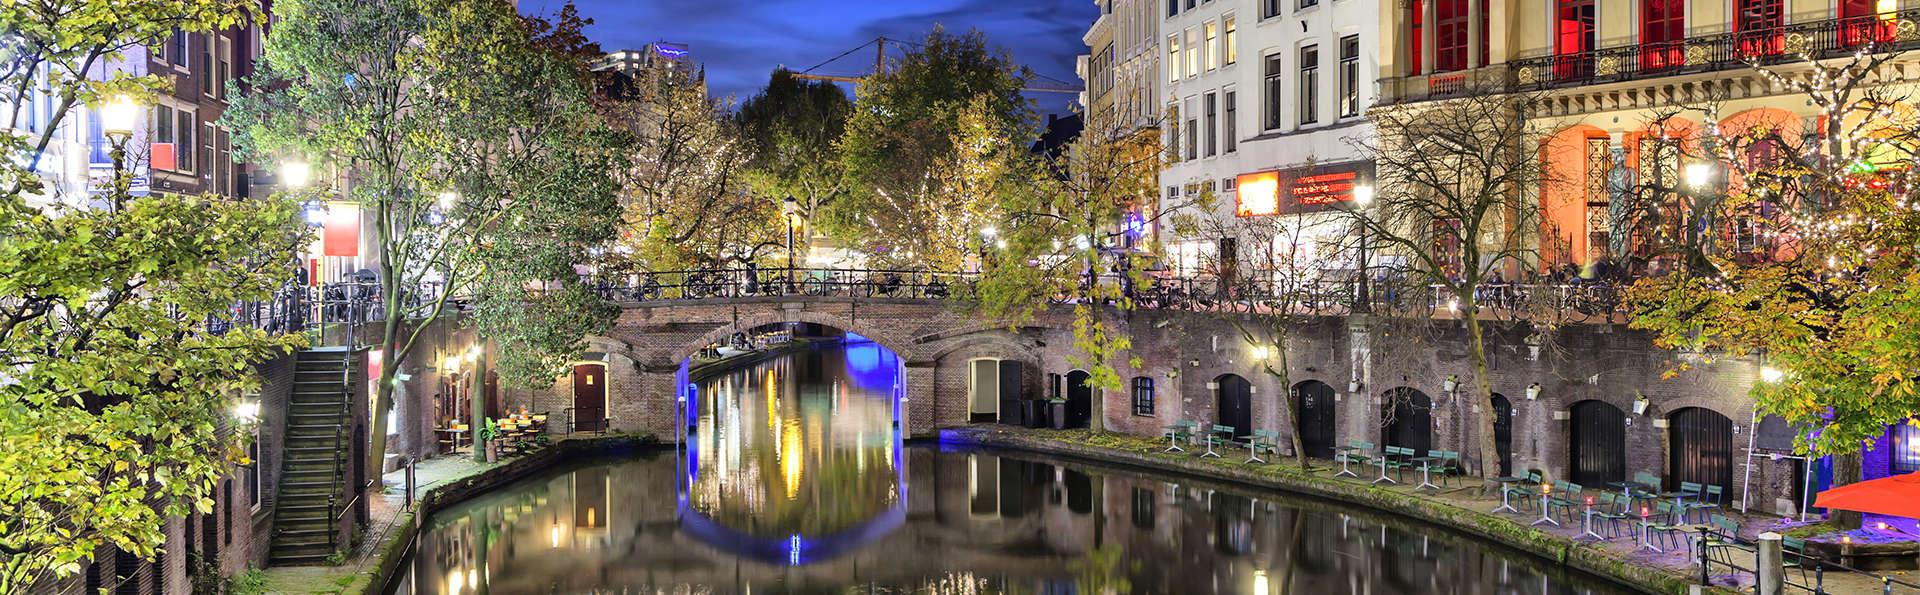 Van der Valk Hotel Houten - Utrecht - Edit_Utrecht.jpg